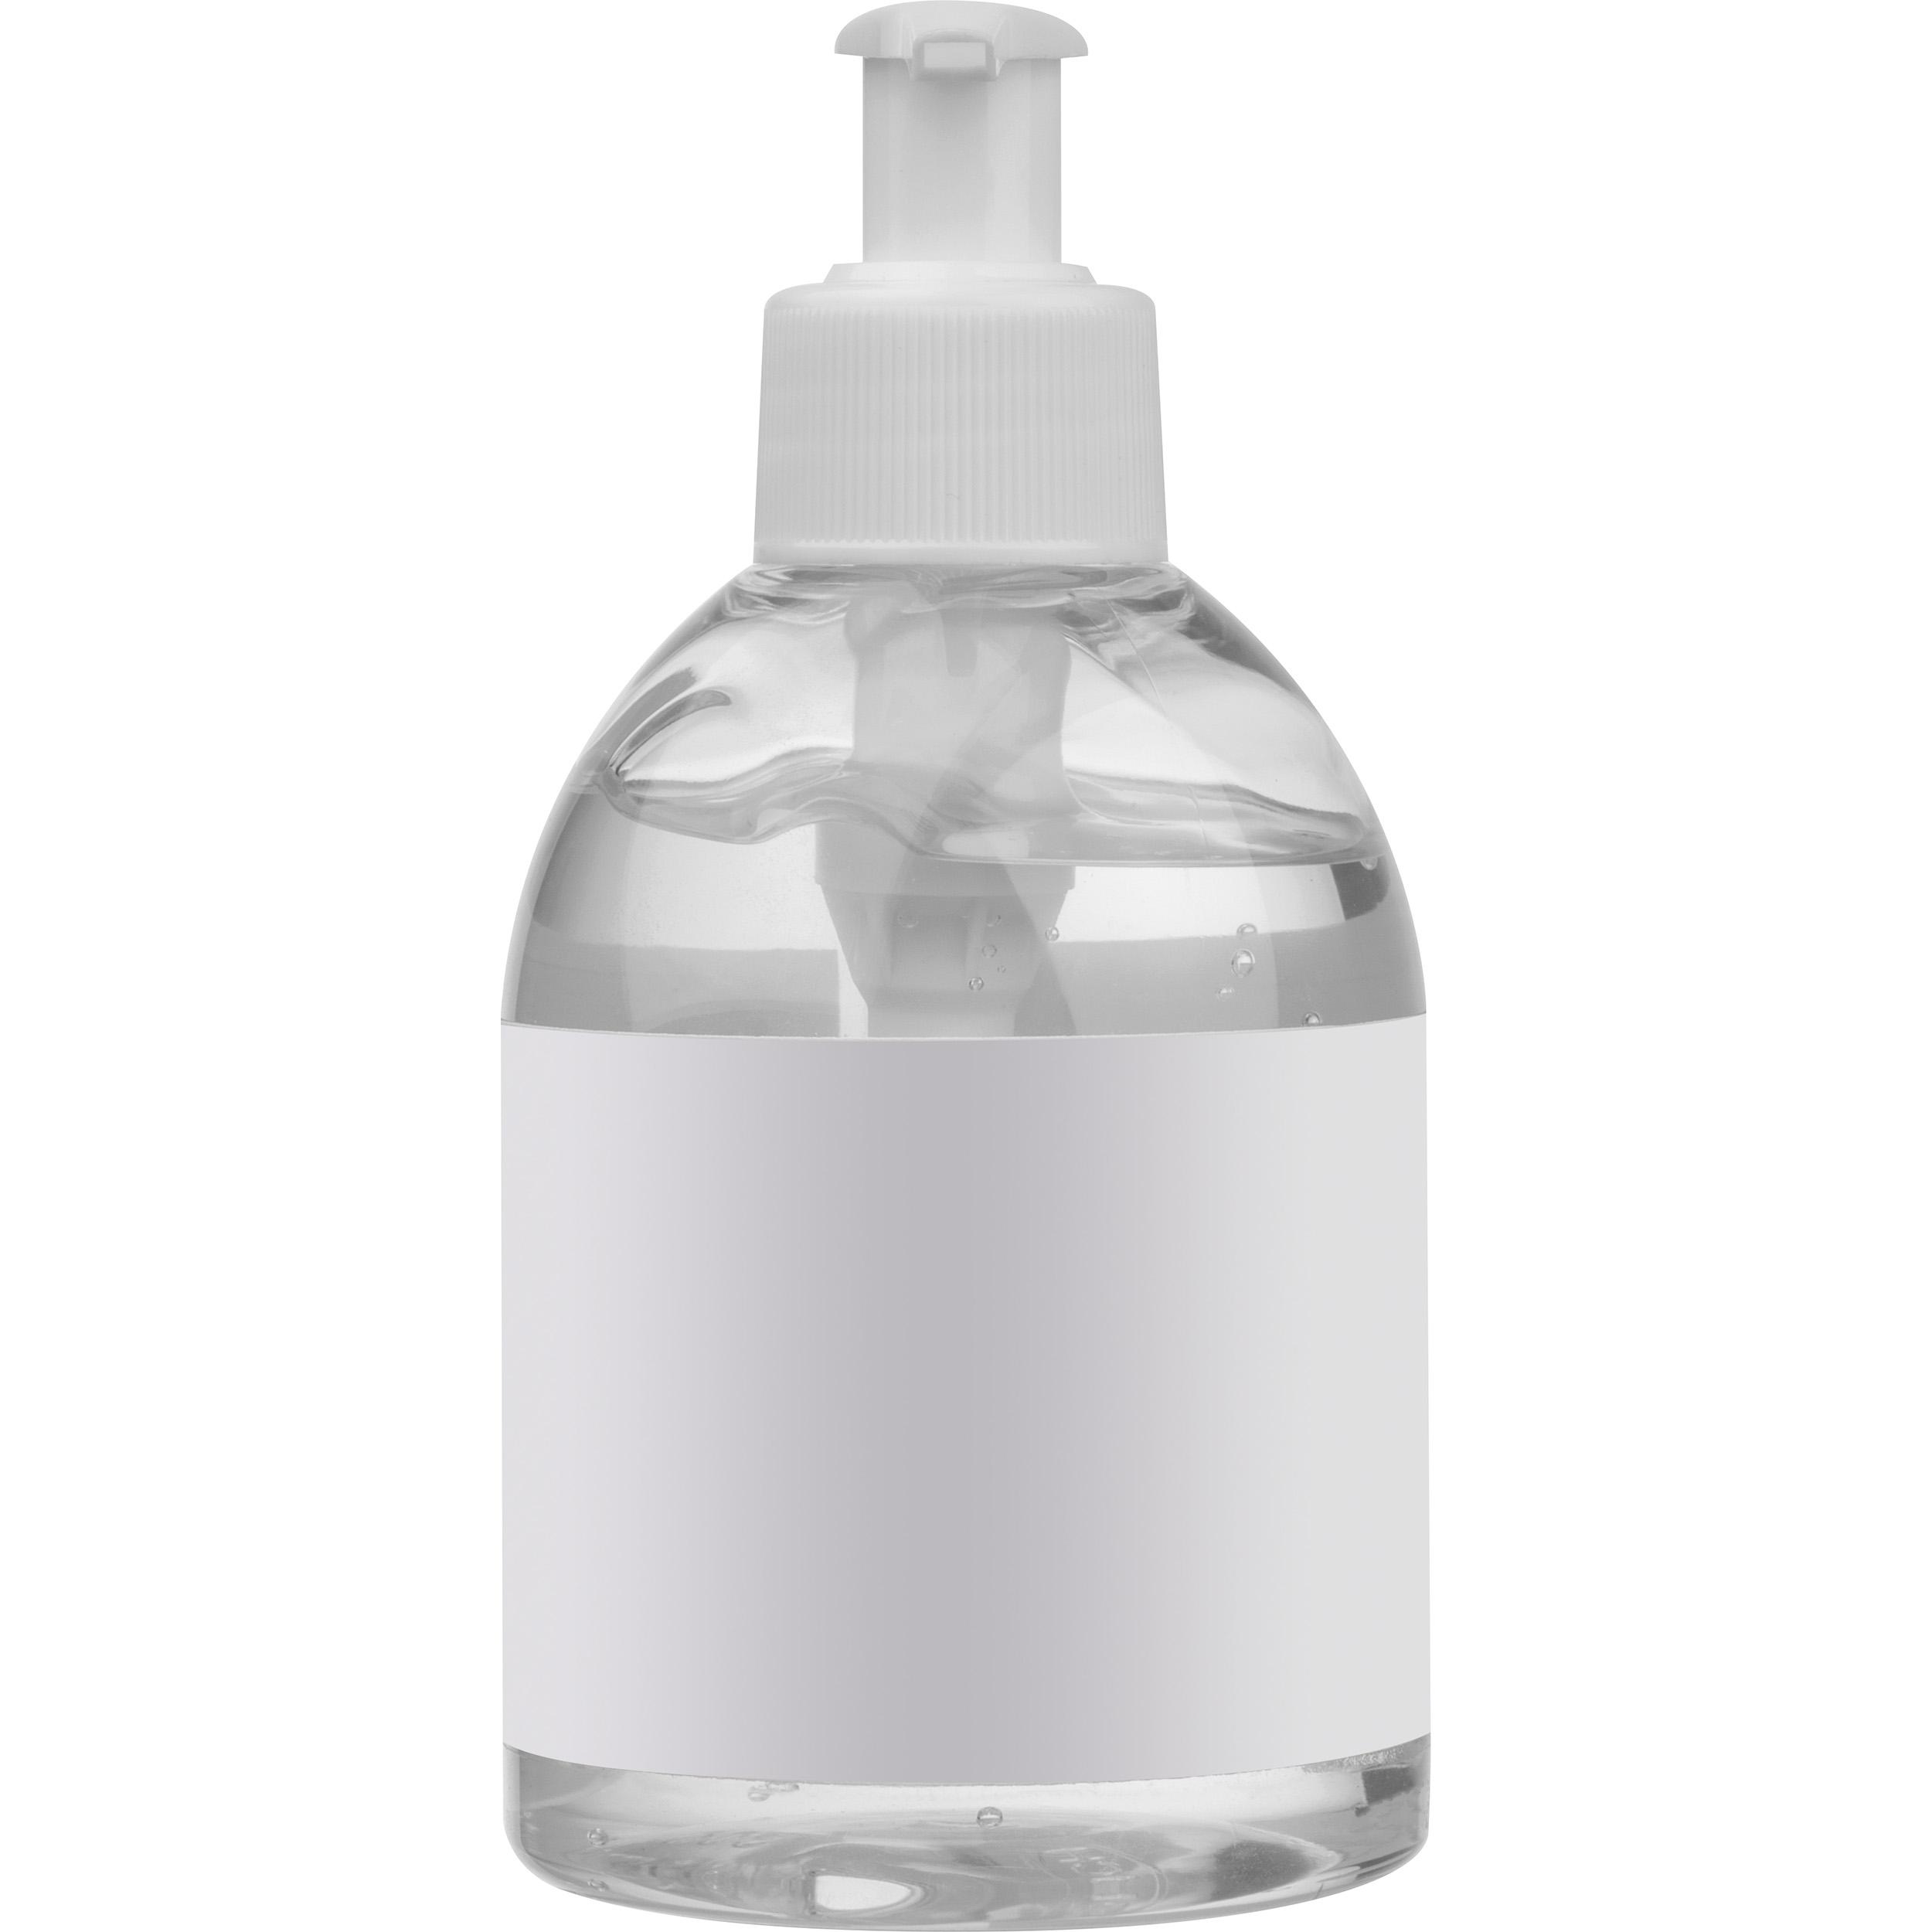 Desinfection gel